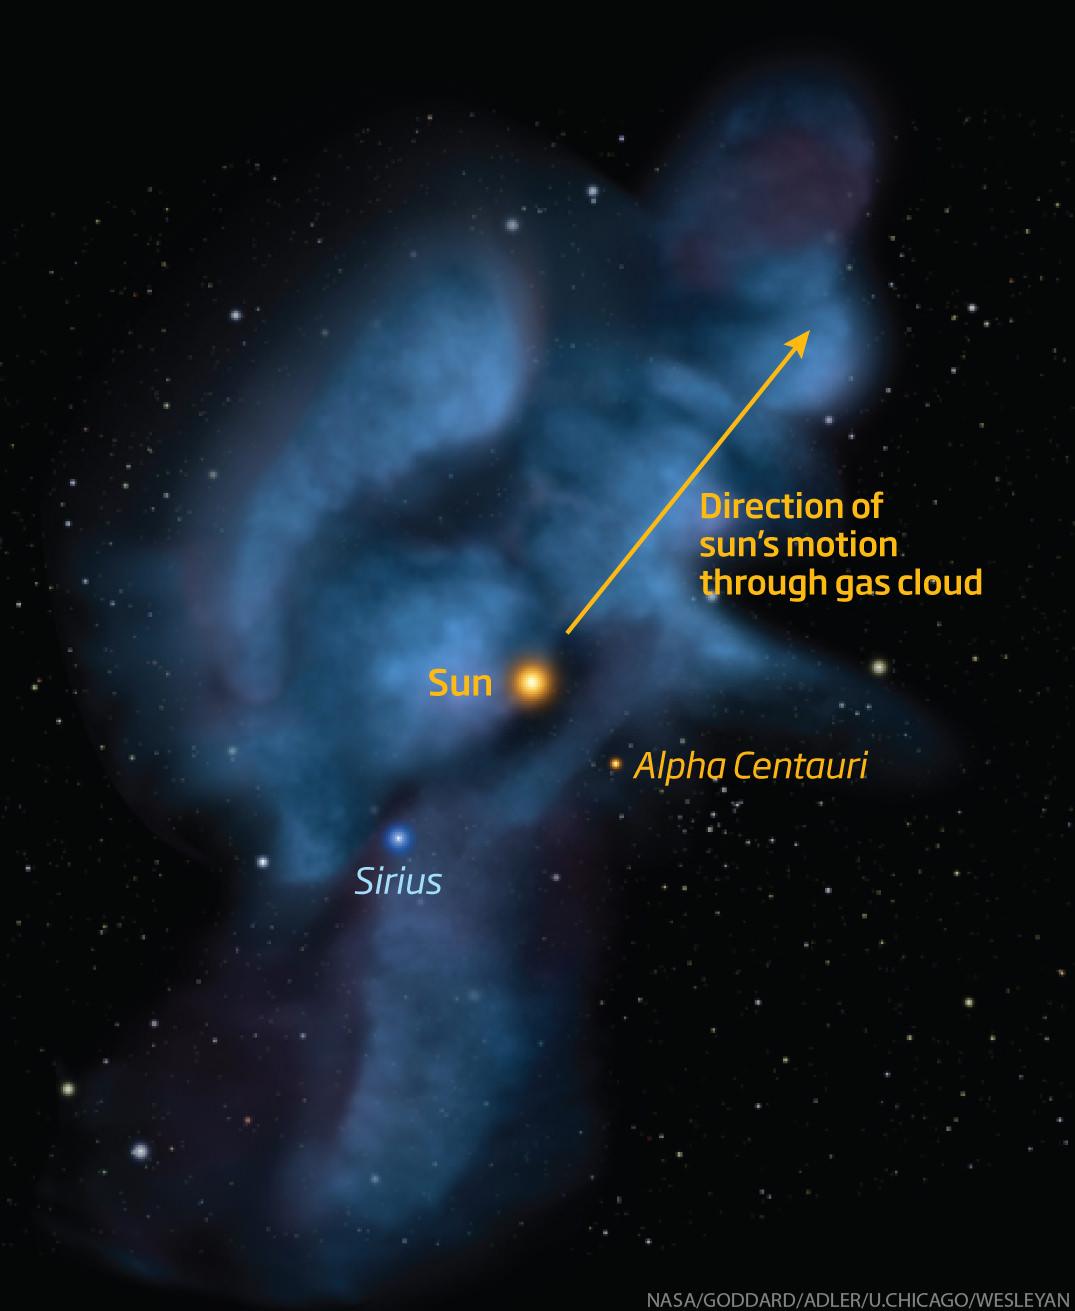 Solar system caught in an interstellar tempest